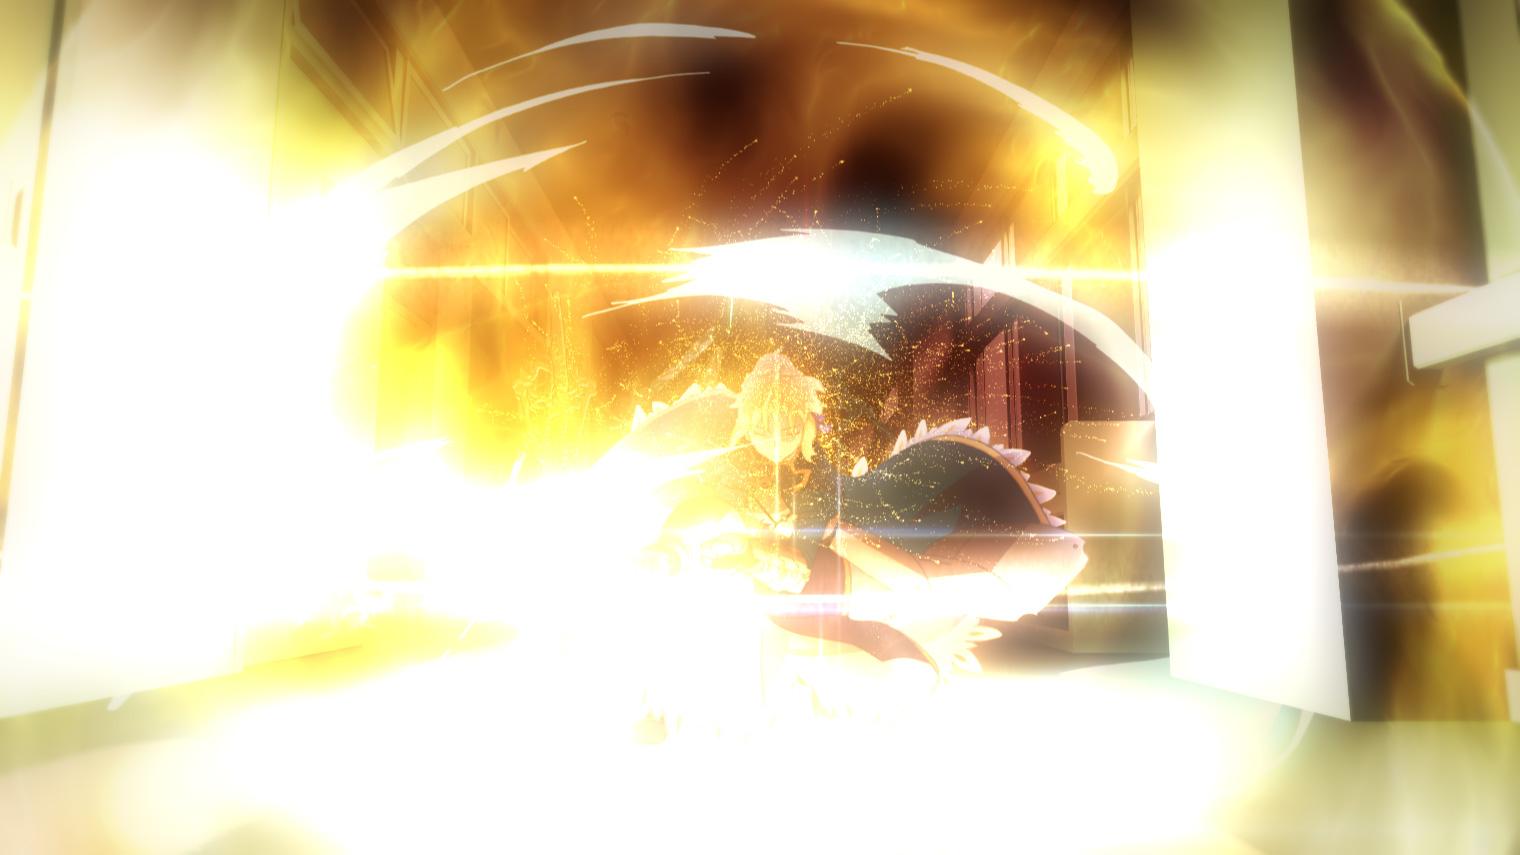 Fate-stay-night-Unlimited-Blade-Works_Haruhichan.com-Blu-ray-3